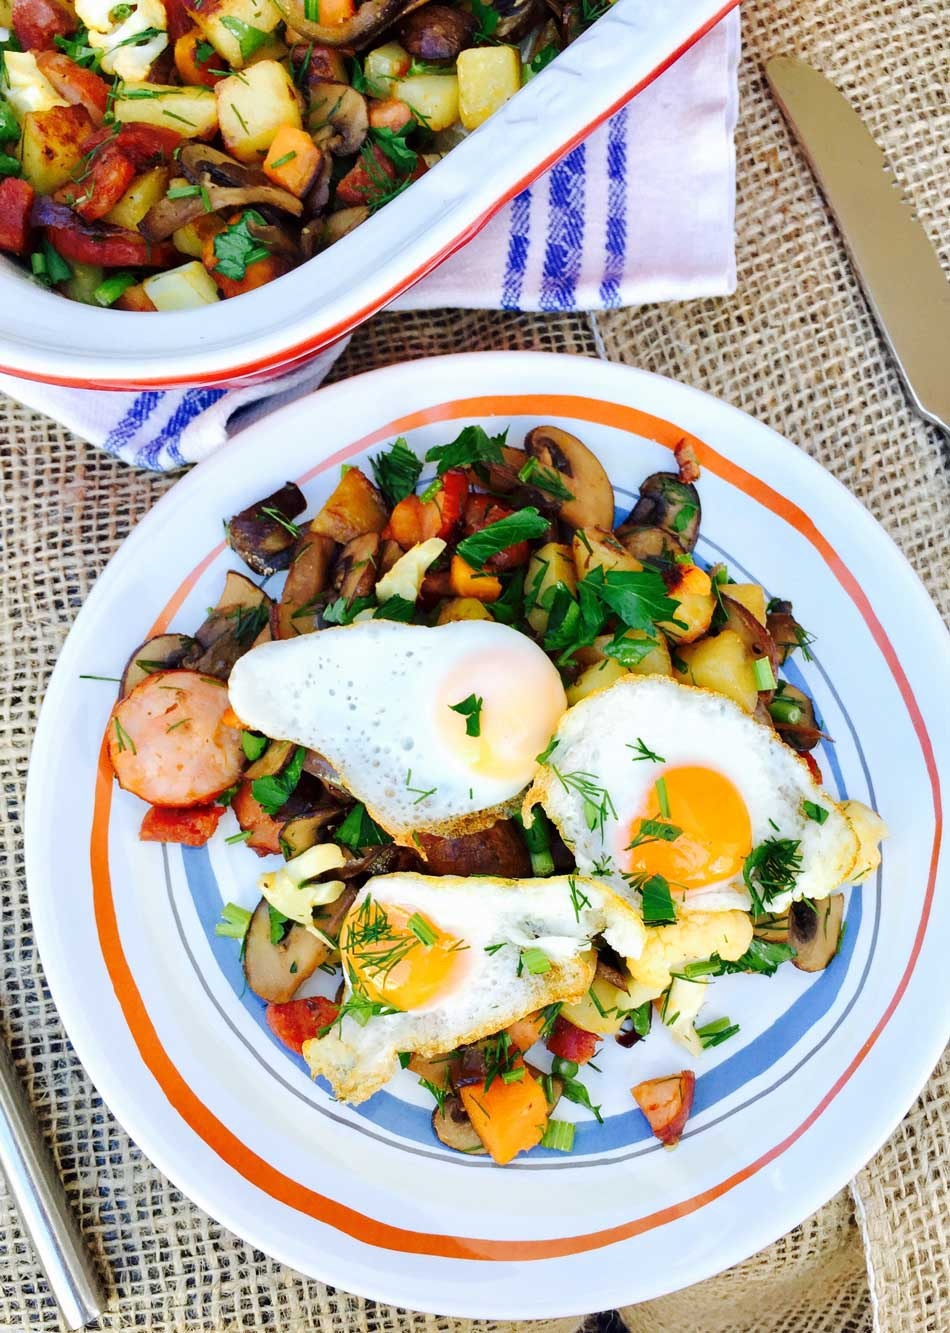 quail eggs, potato and mushrooms plate